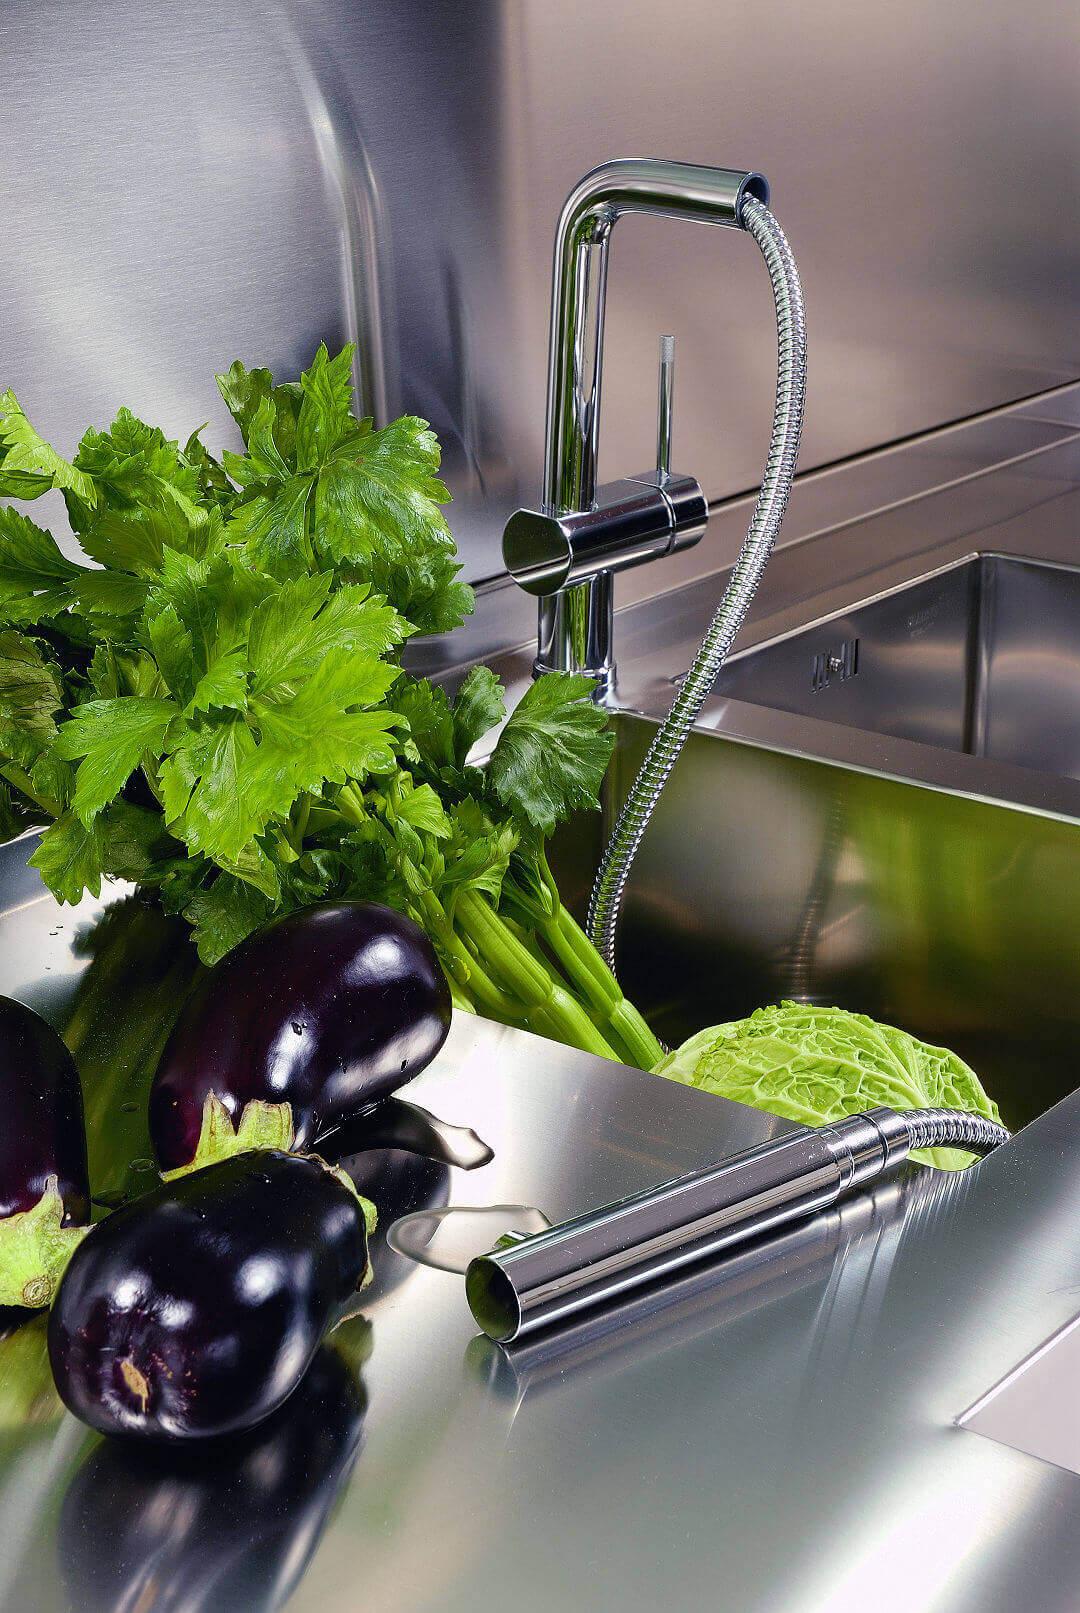 Arca Cucine Italy - Domestic stainless steel kitchens - 20 - Retunne - Sink